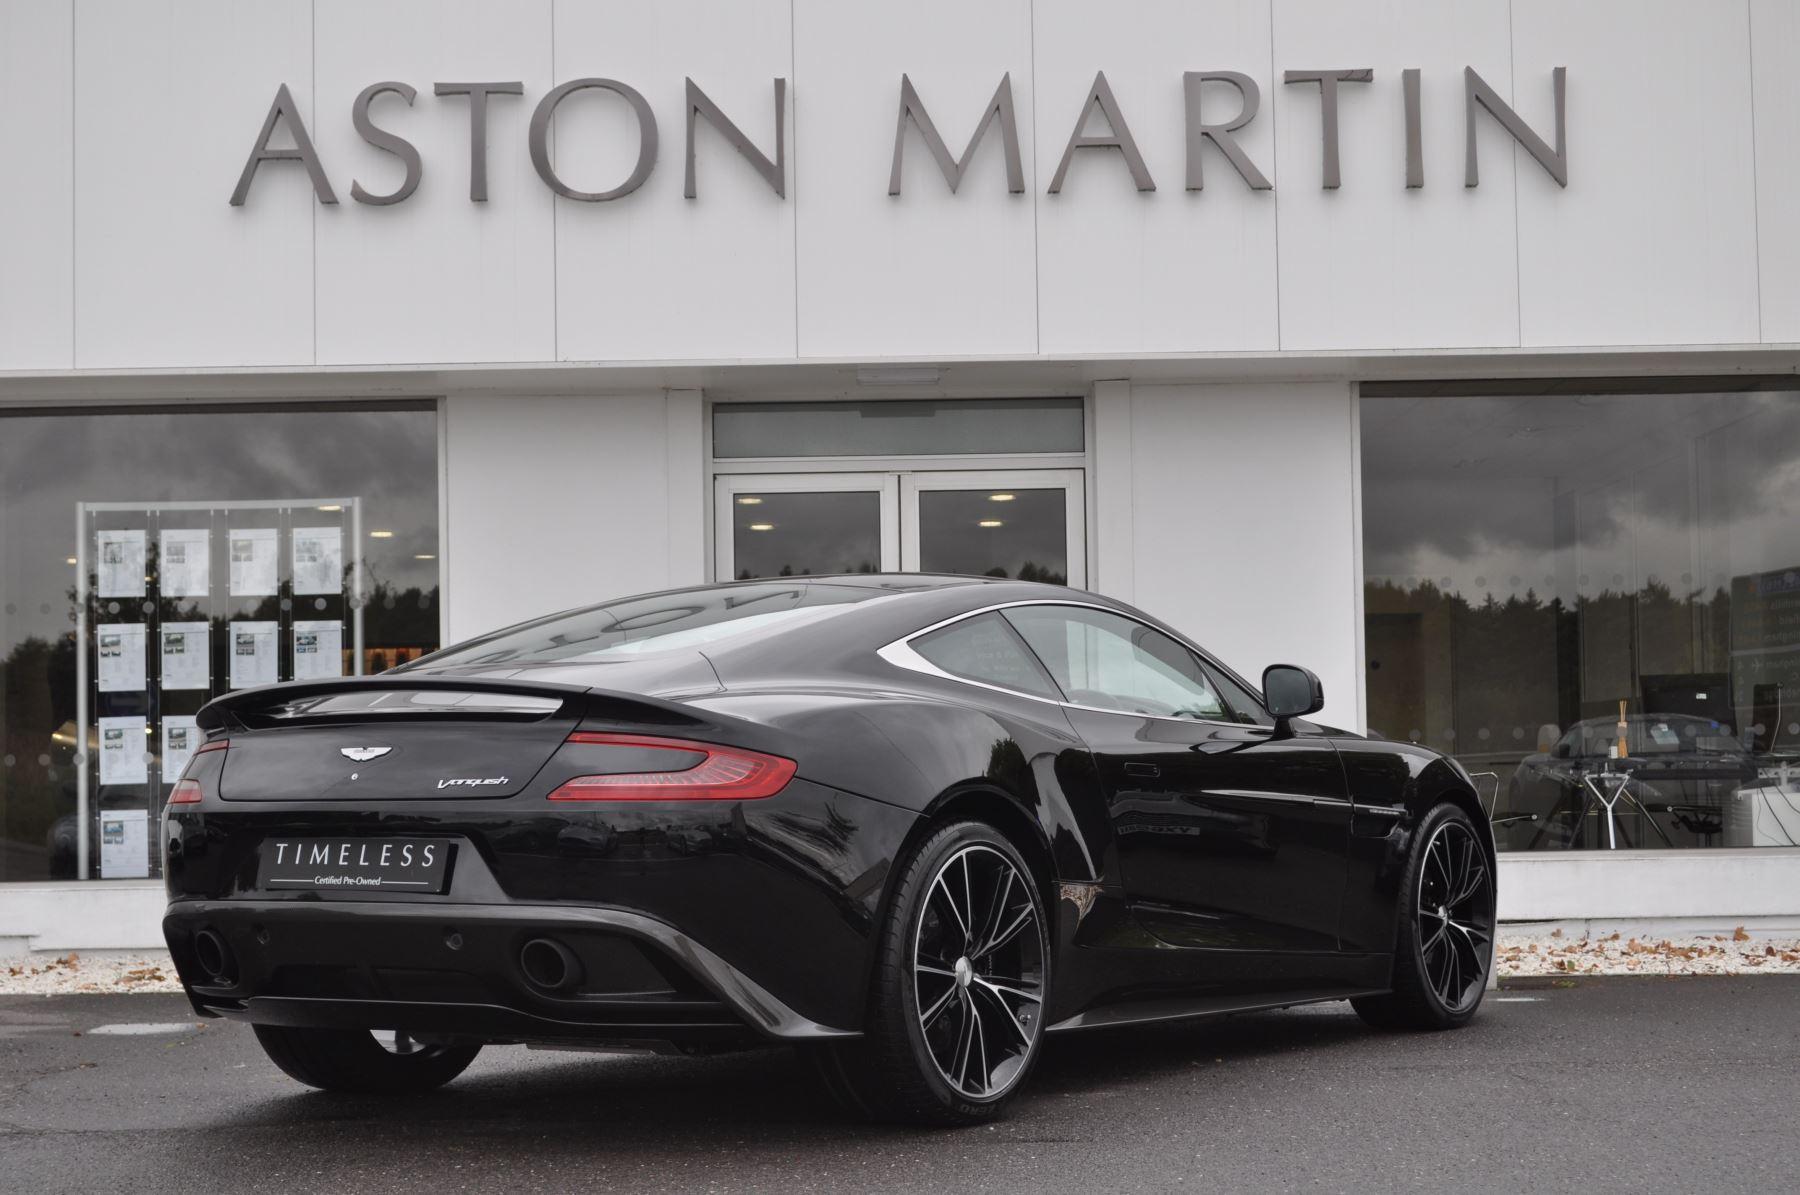 Aston Martin Vanquish V12 [568] 2+2 2dr Touchtronic image 5